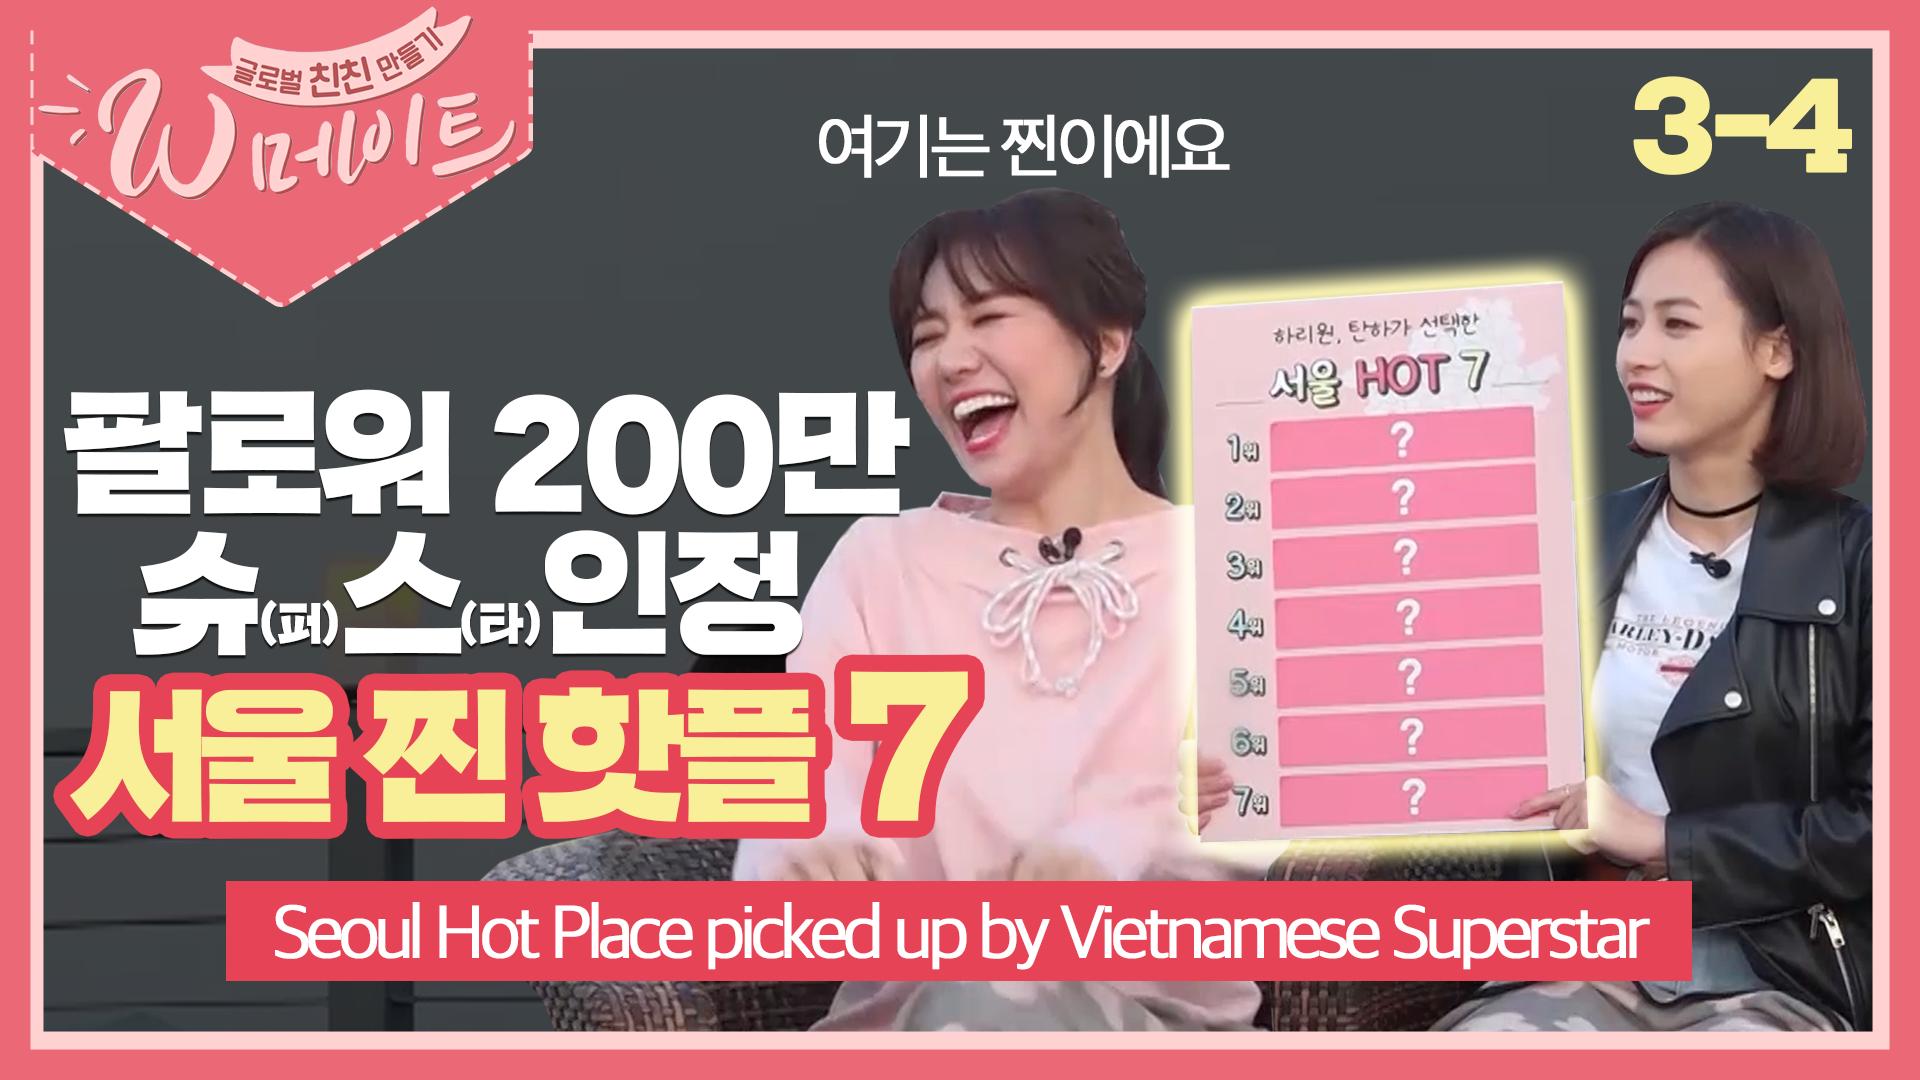 [W메이트 14화]팔로워 200만 슈퍼스타인정! 서울 찐 핫플 7